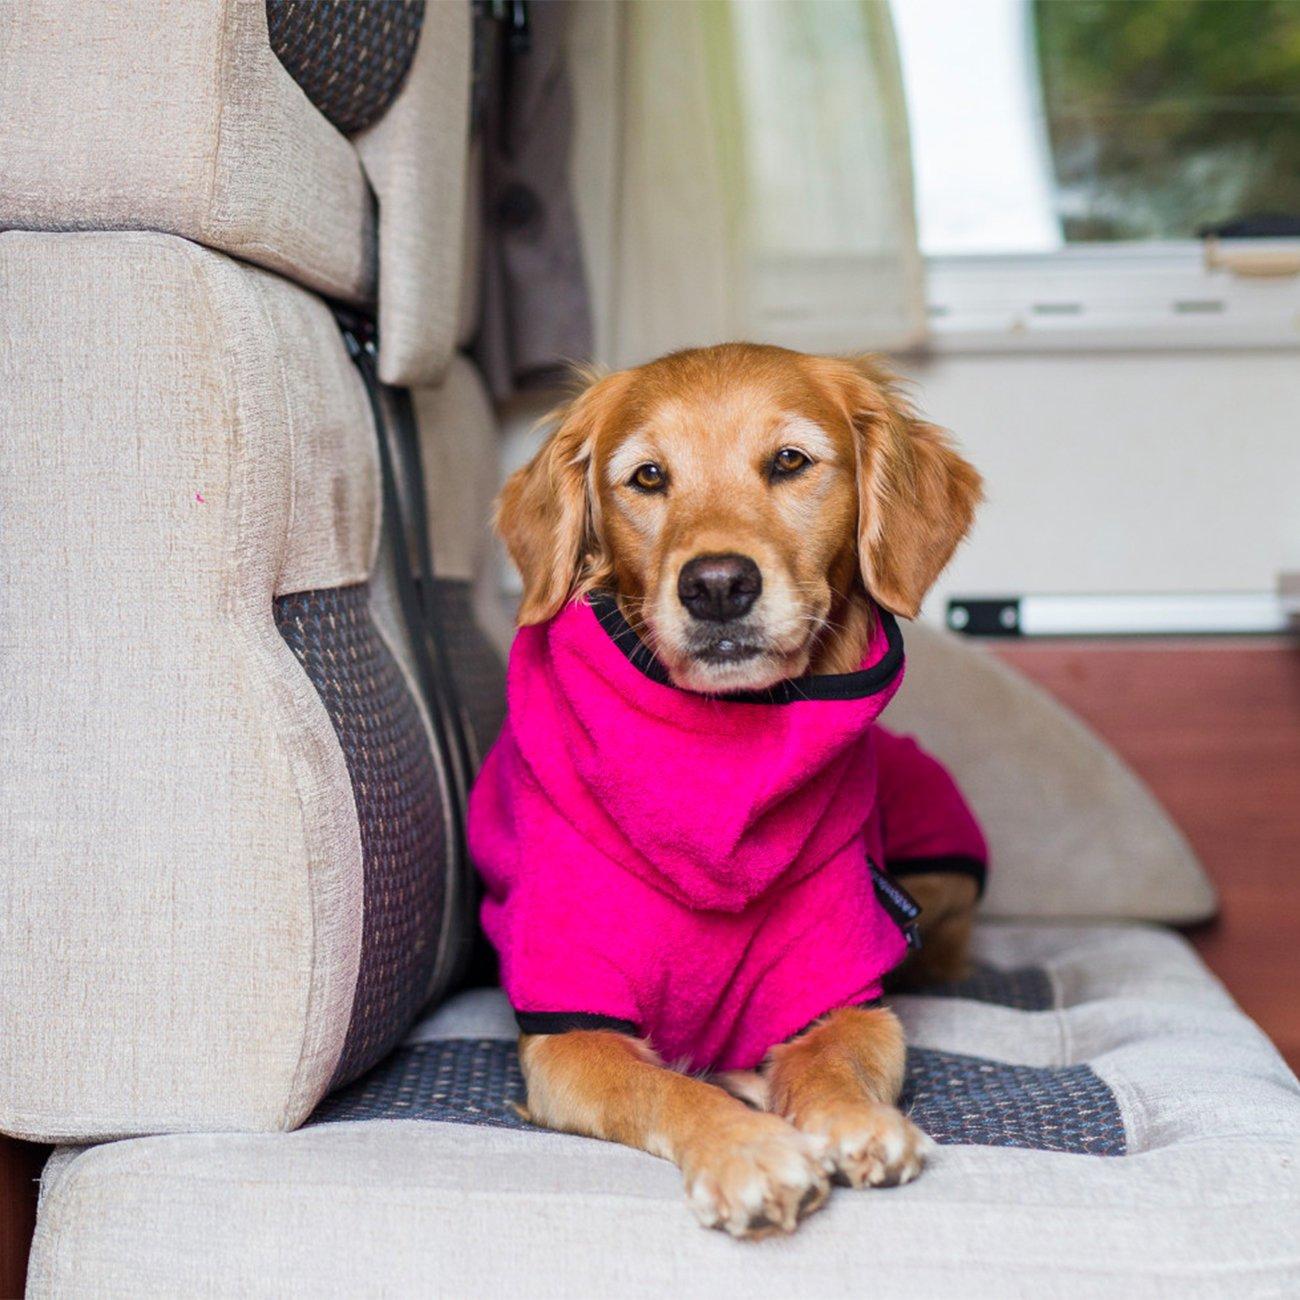 fit4dogs Trockenmantel Hund Dryup Cape, Bild 20